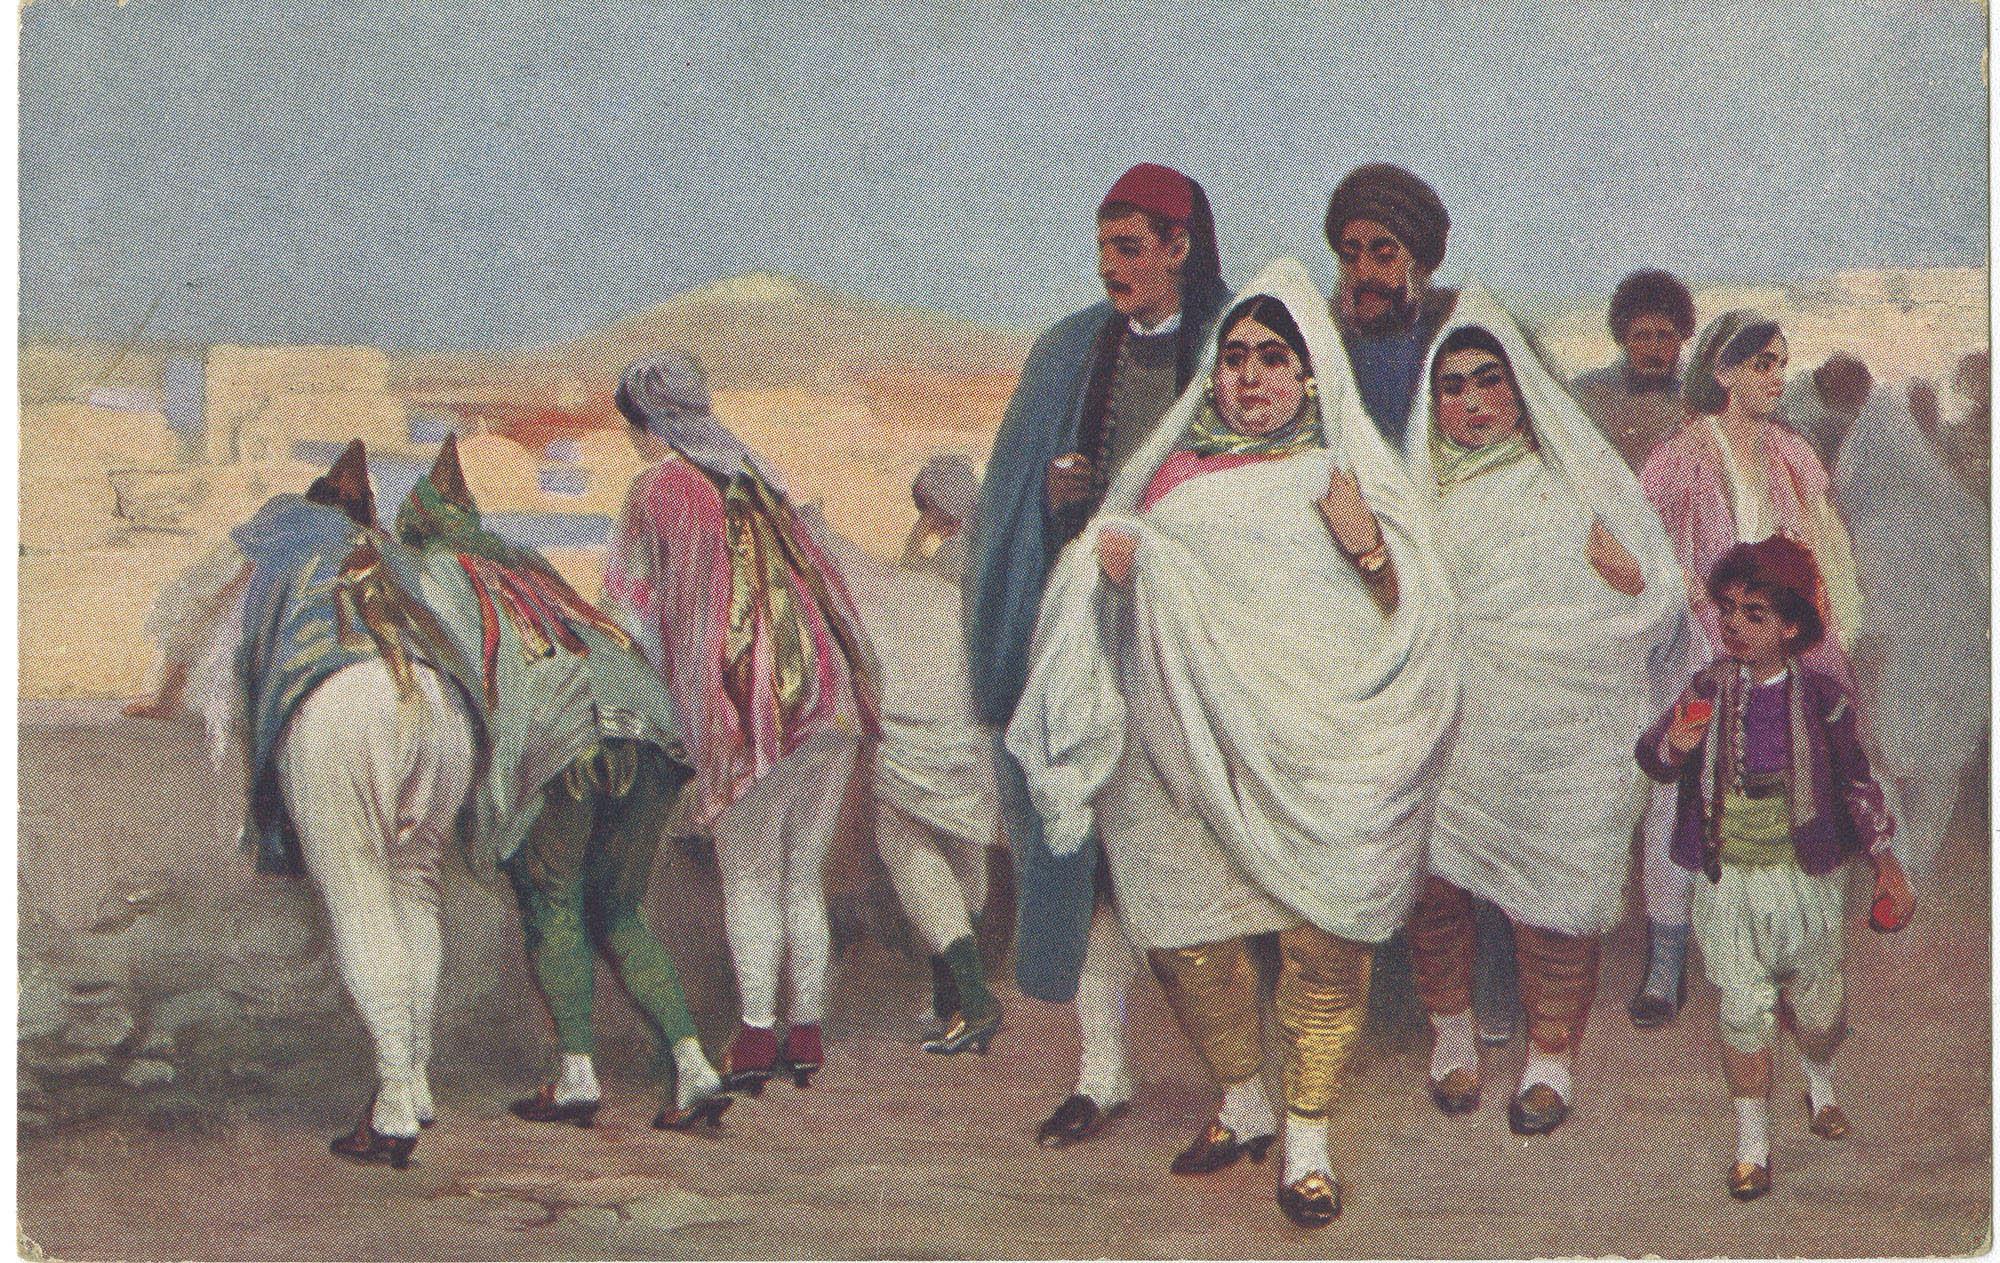 Jews-Promenade in Tunis